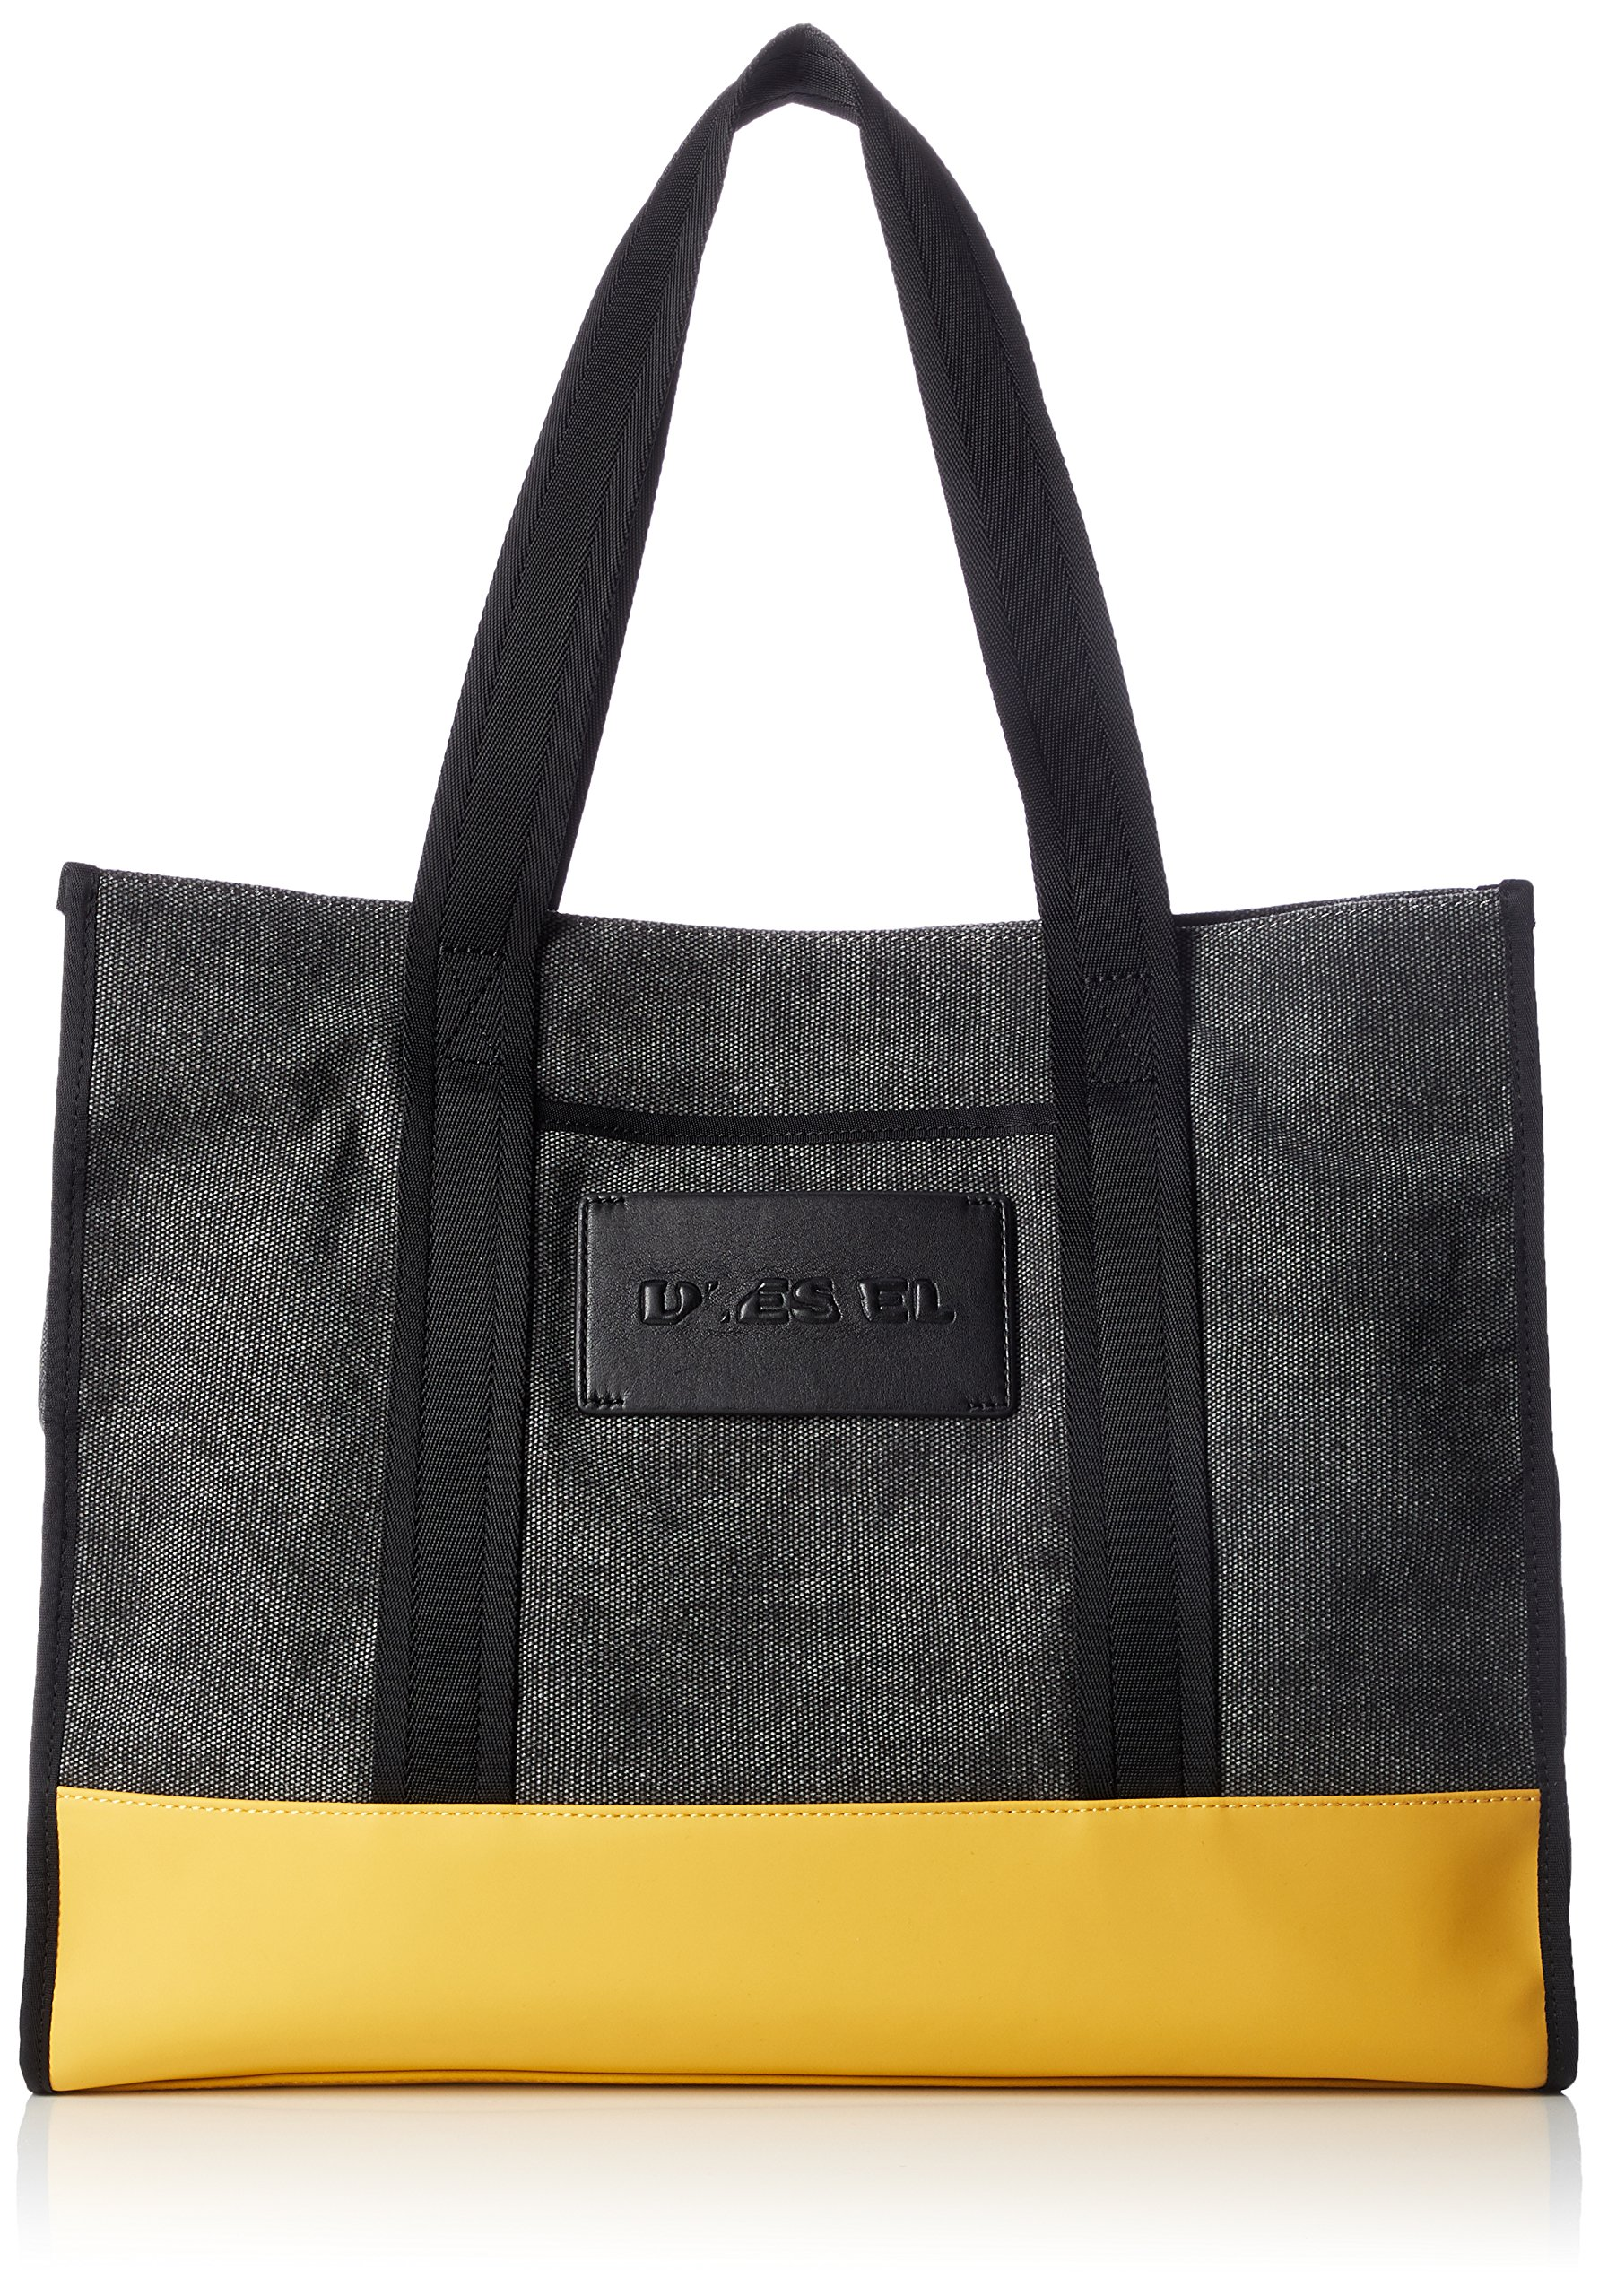 Diesel Men's M-CAGE Shopper-Shopping Bag, anthracite/golden rod One Size